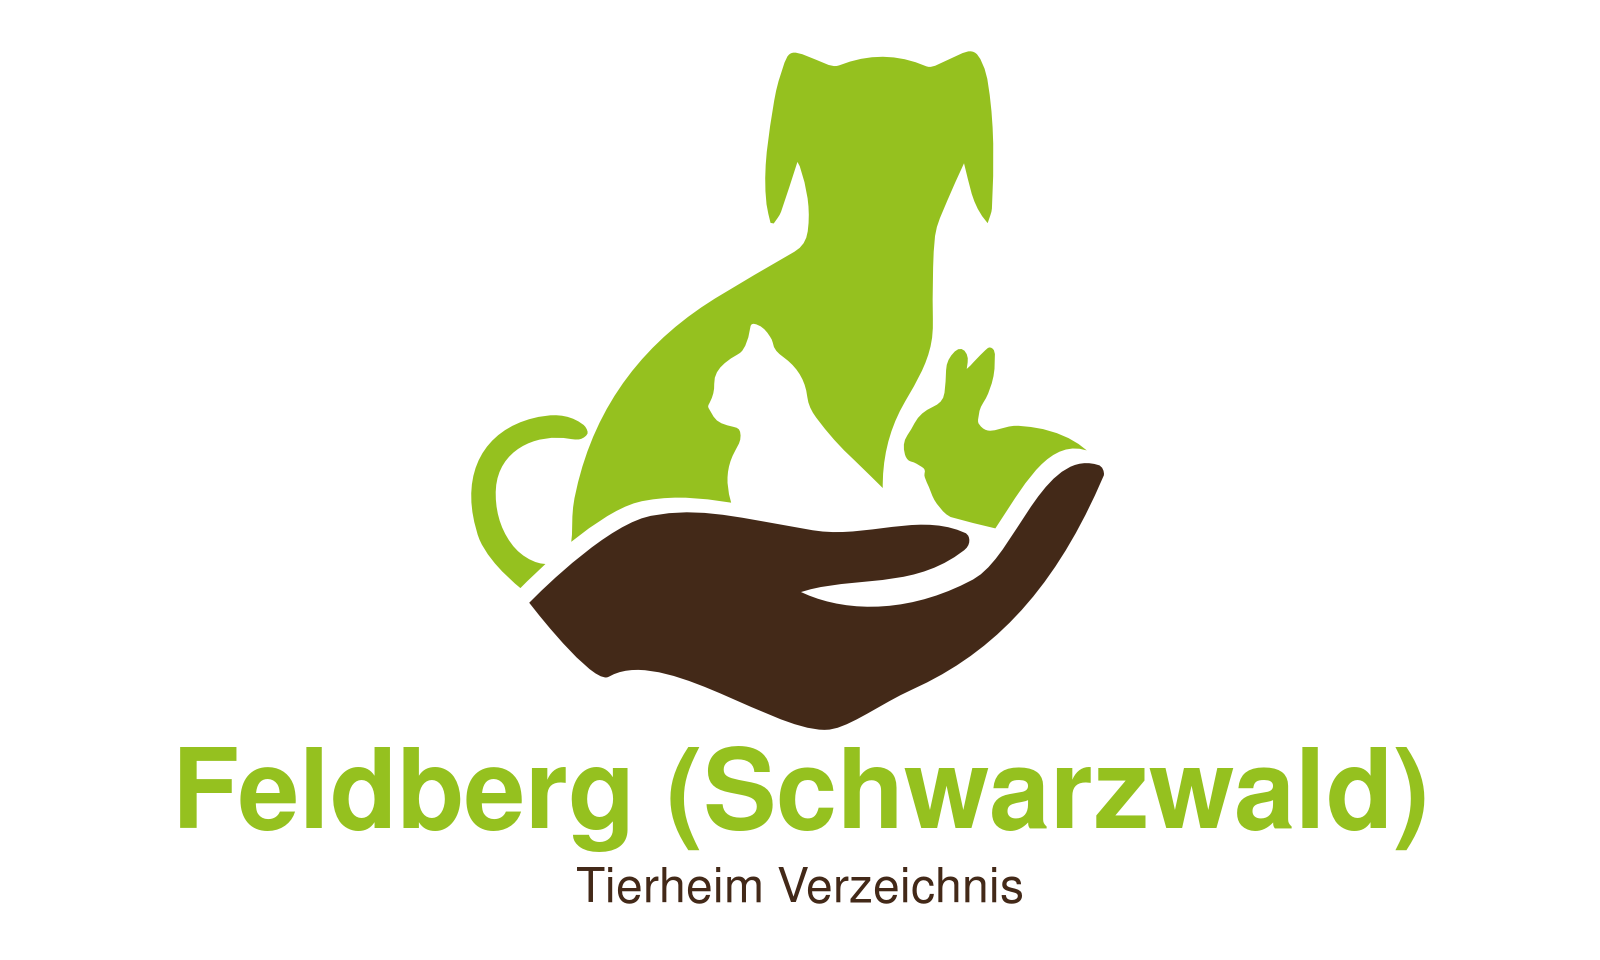 Tierheim Feldberg (Schwarzwald)